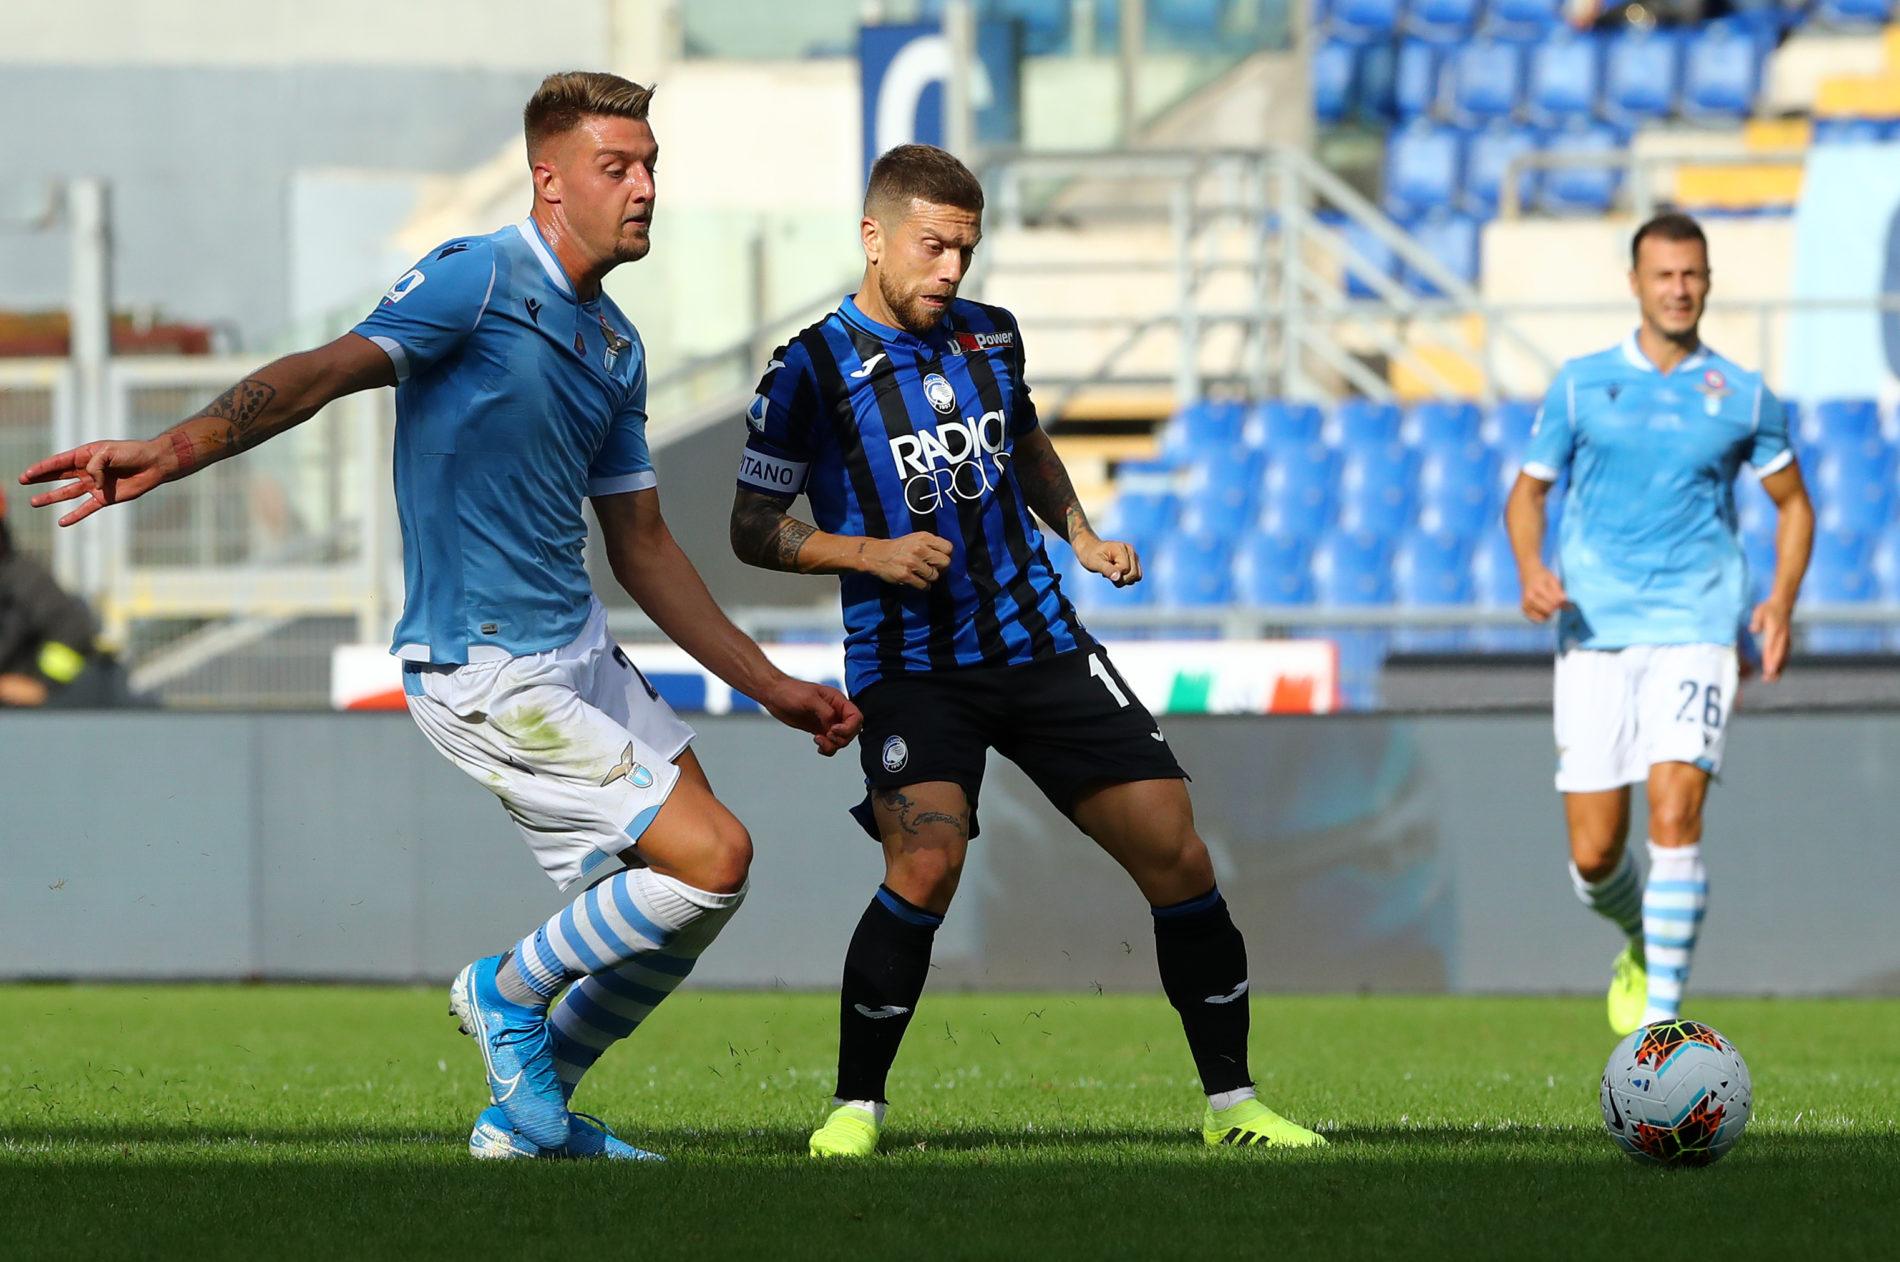 Lazio - Atalanta, Sergej Milinkovic e il Papu Gomez